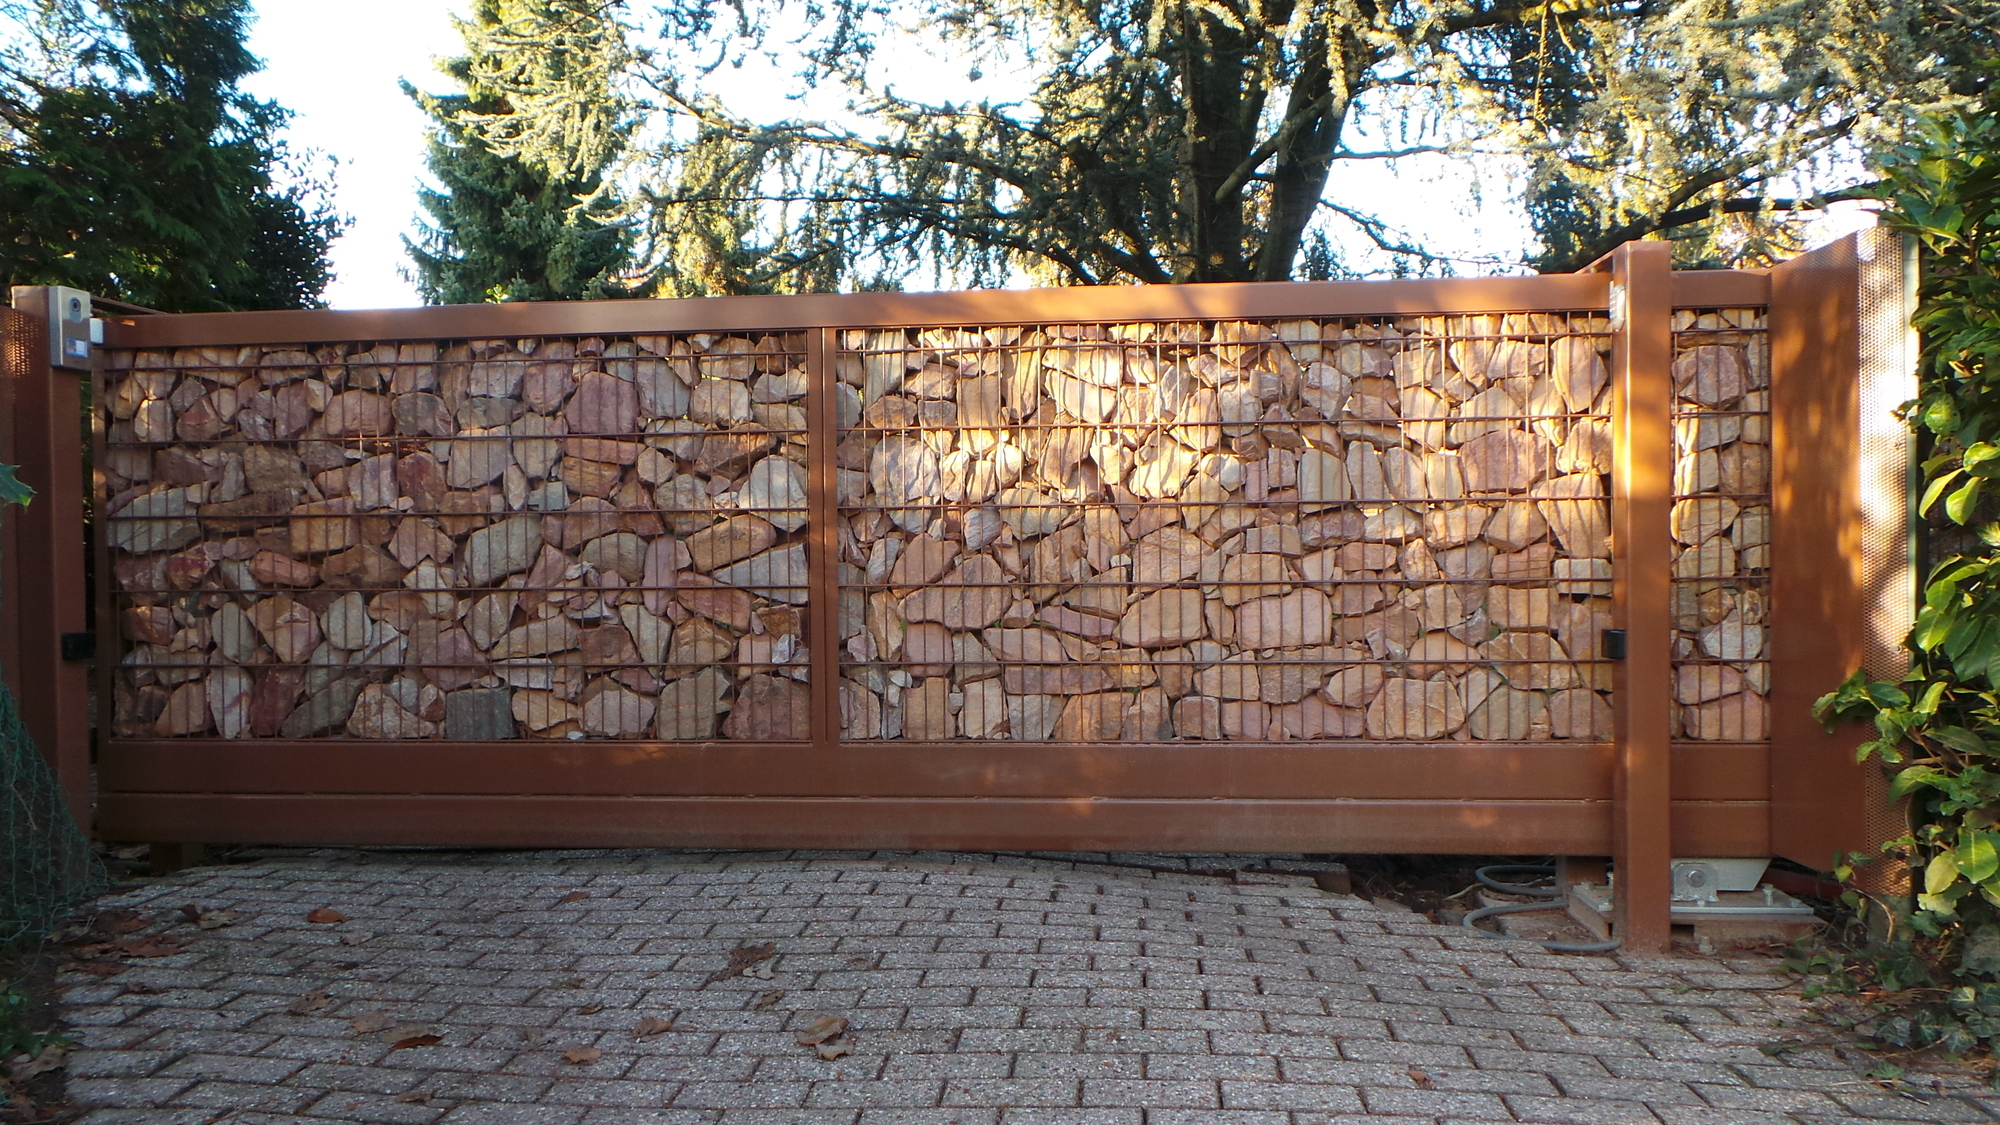 Vrijdragende stone wall poort